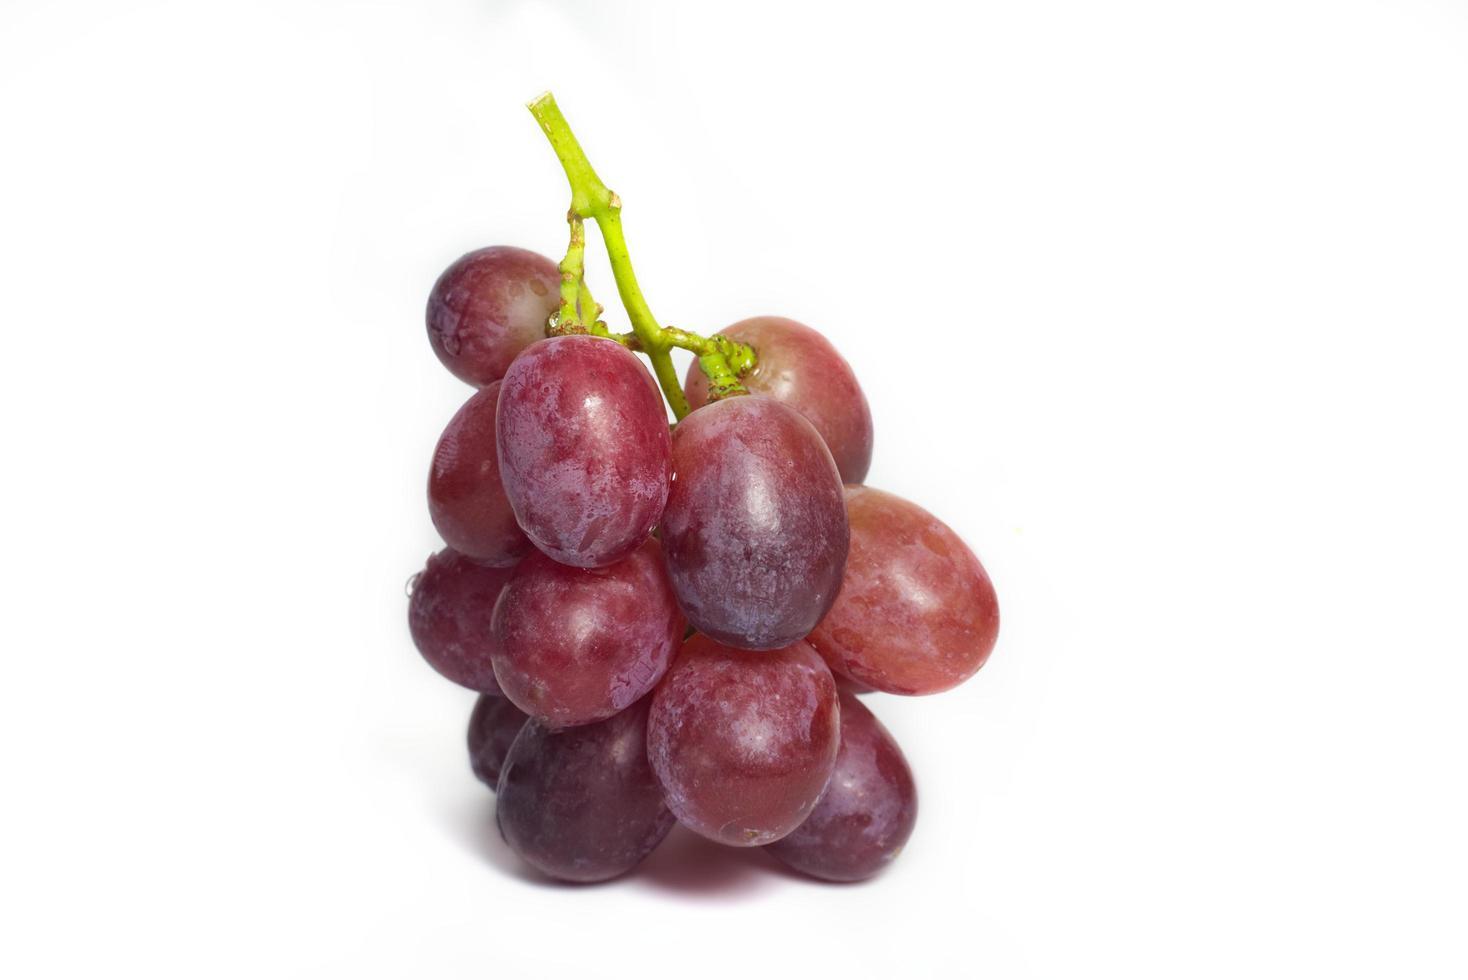 rode druiven op wit foto